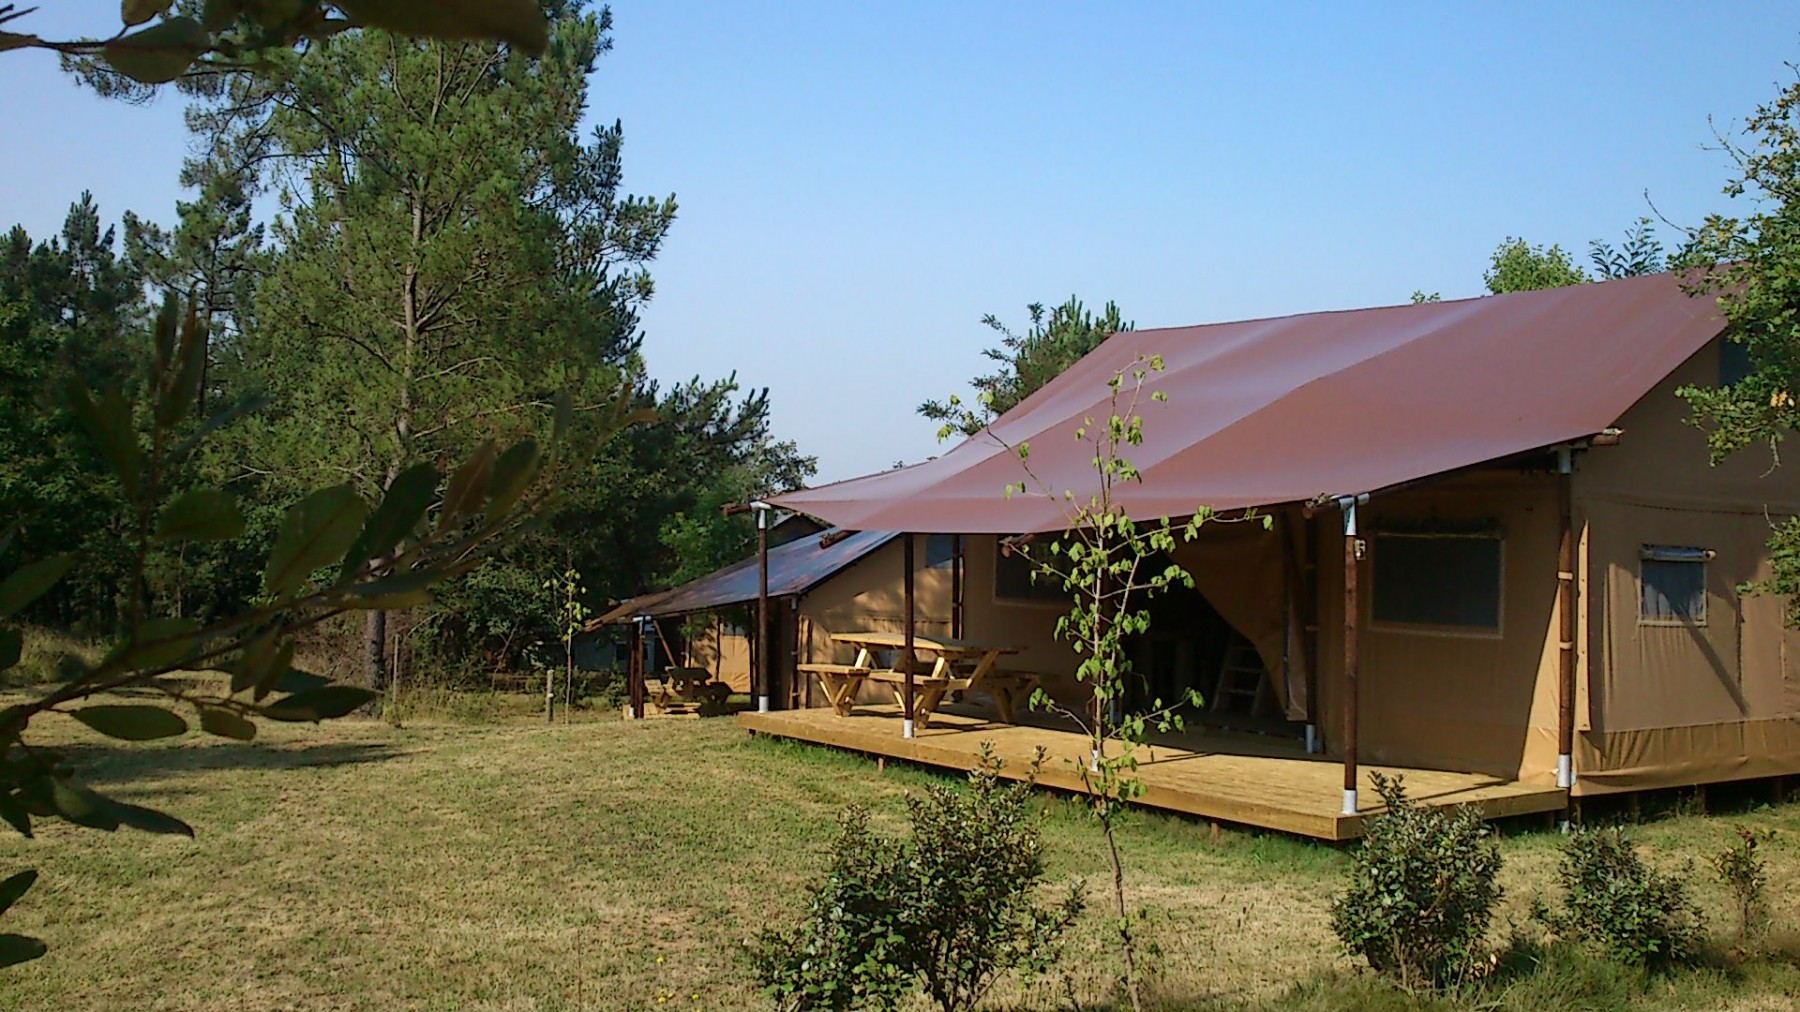 camping dordogne insolite court s jour camping dordogne 4 toiles. Black Bedroom Furniture Sets. Home Design Ideas